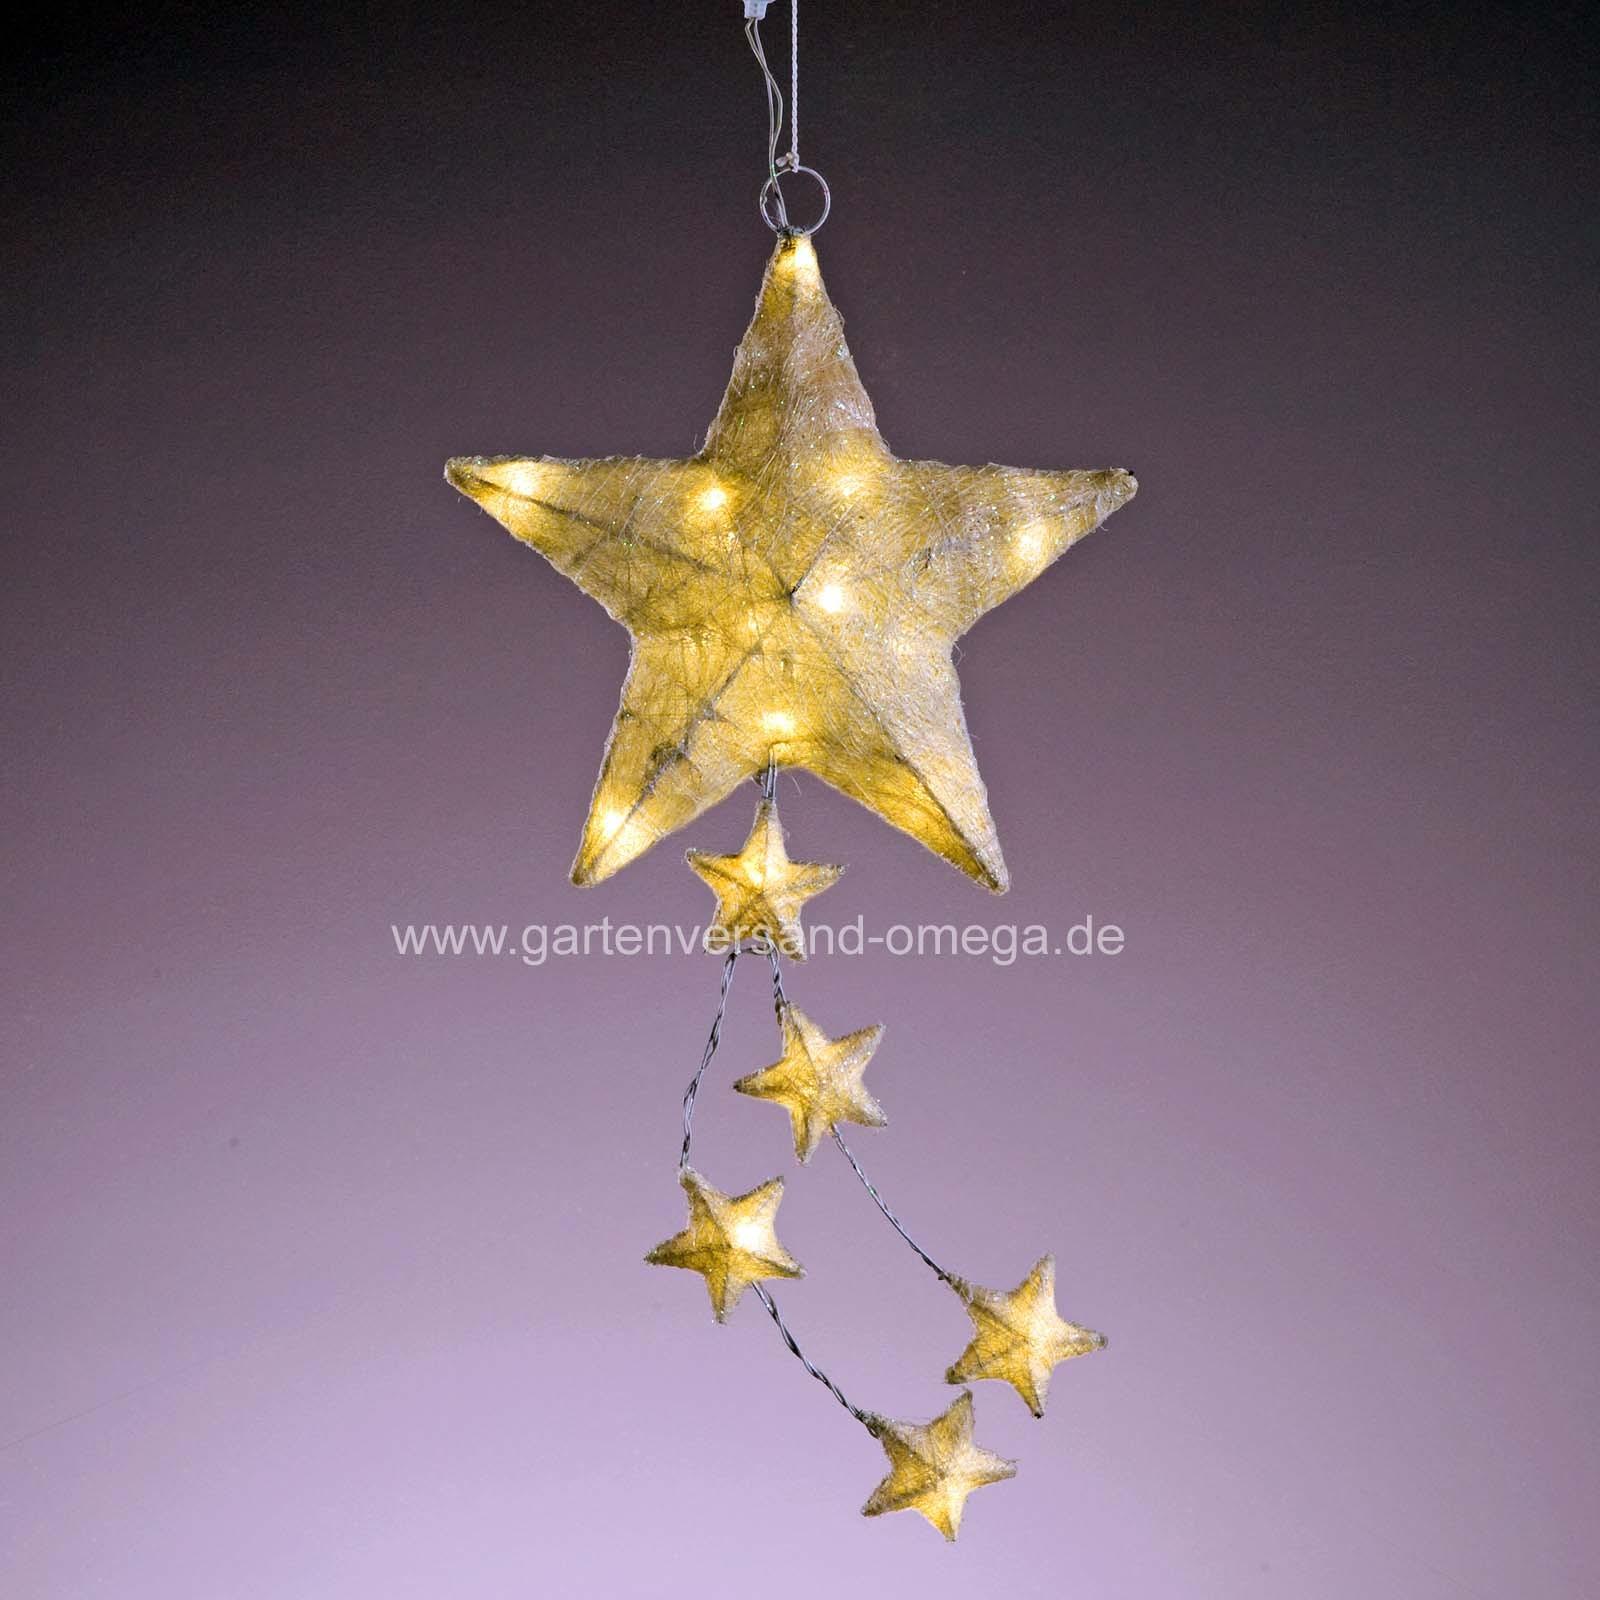 Led weihnachtsbeleuchtung fenster innen my blog for Weihnachtsbeleuchtung fenster